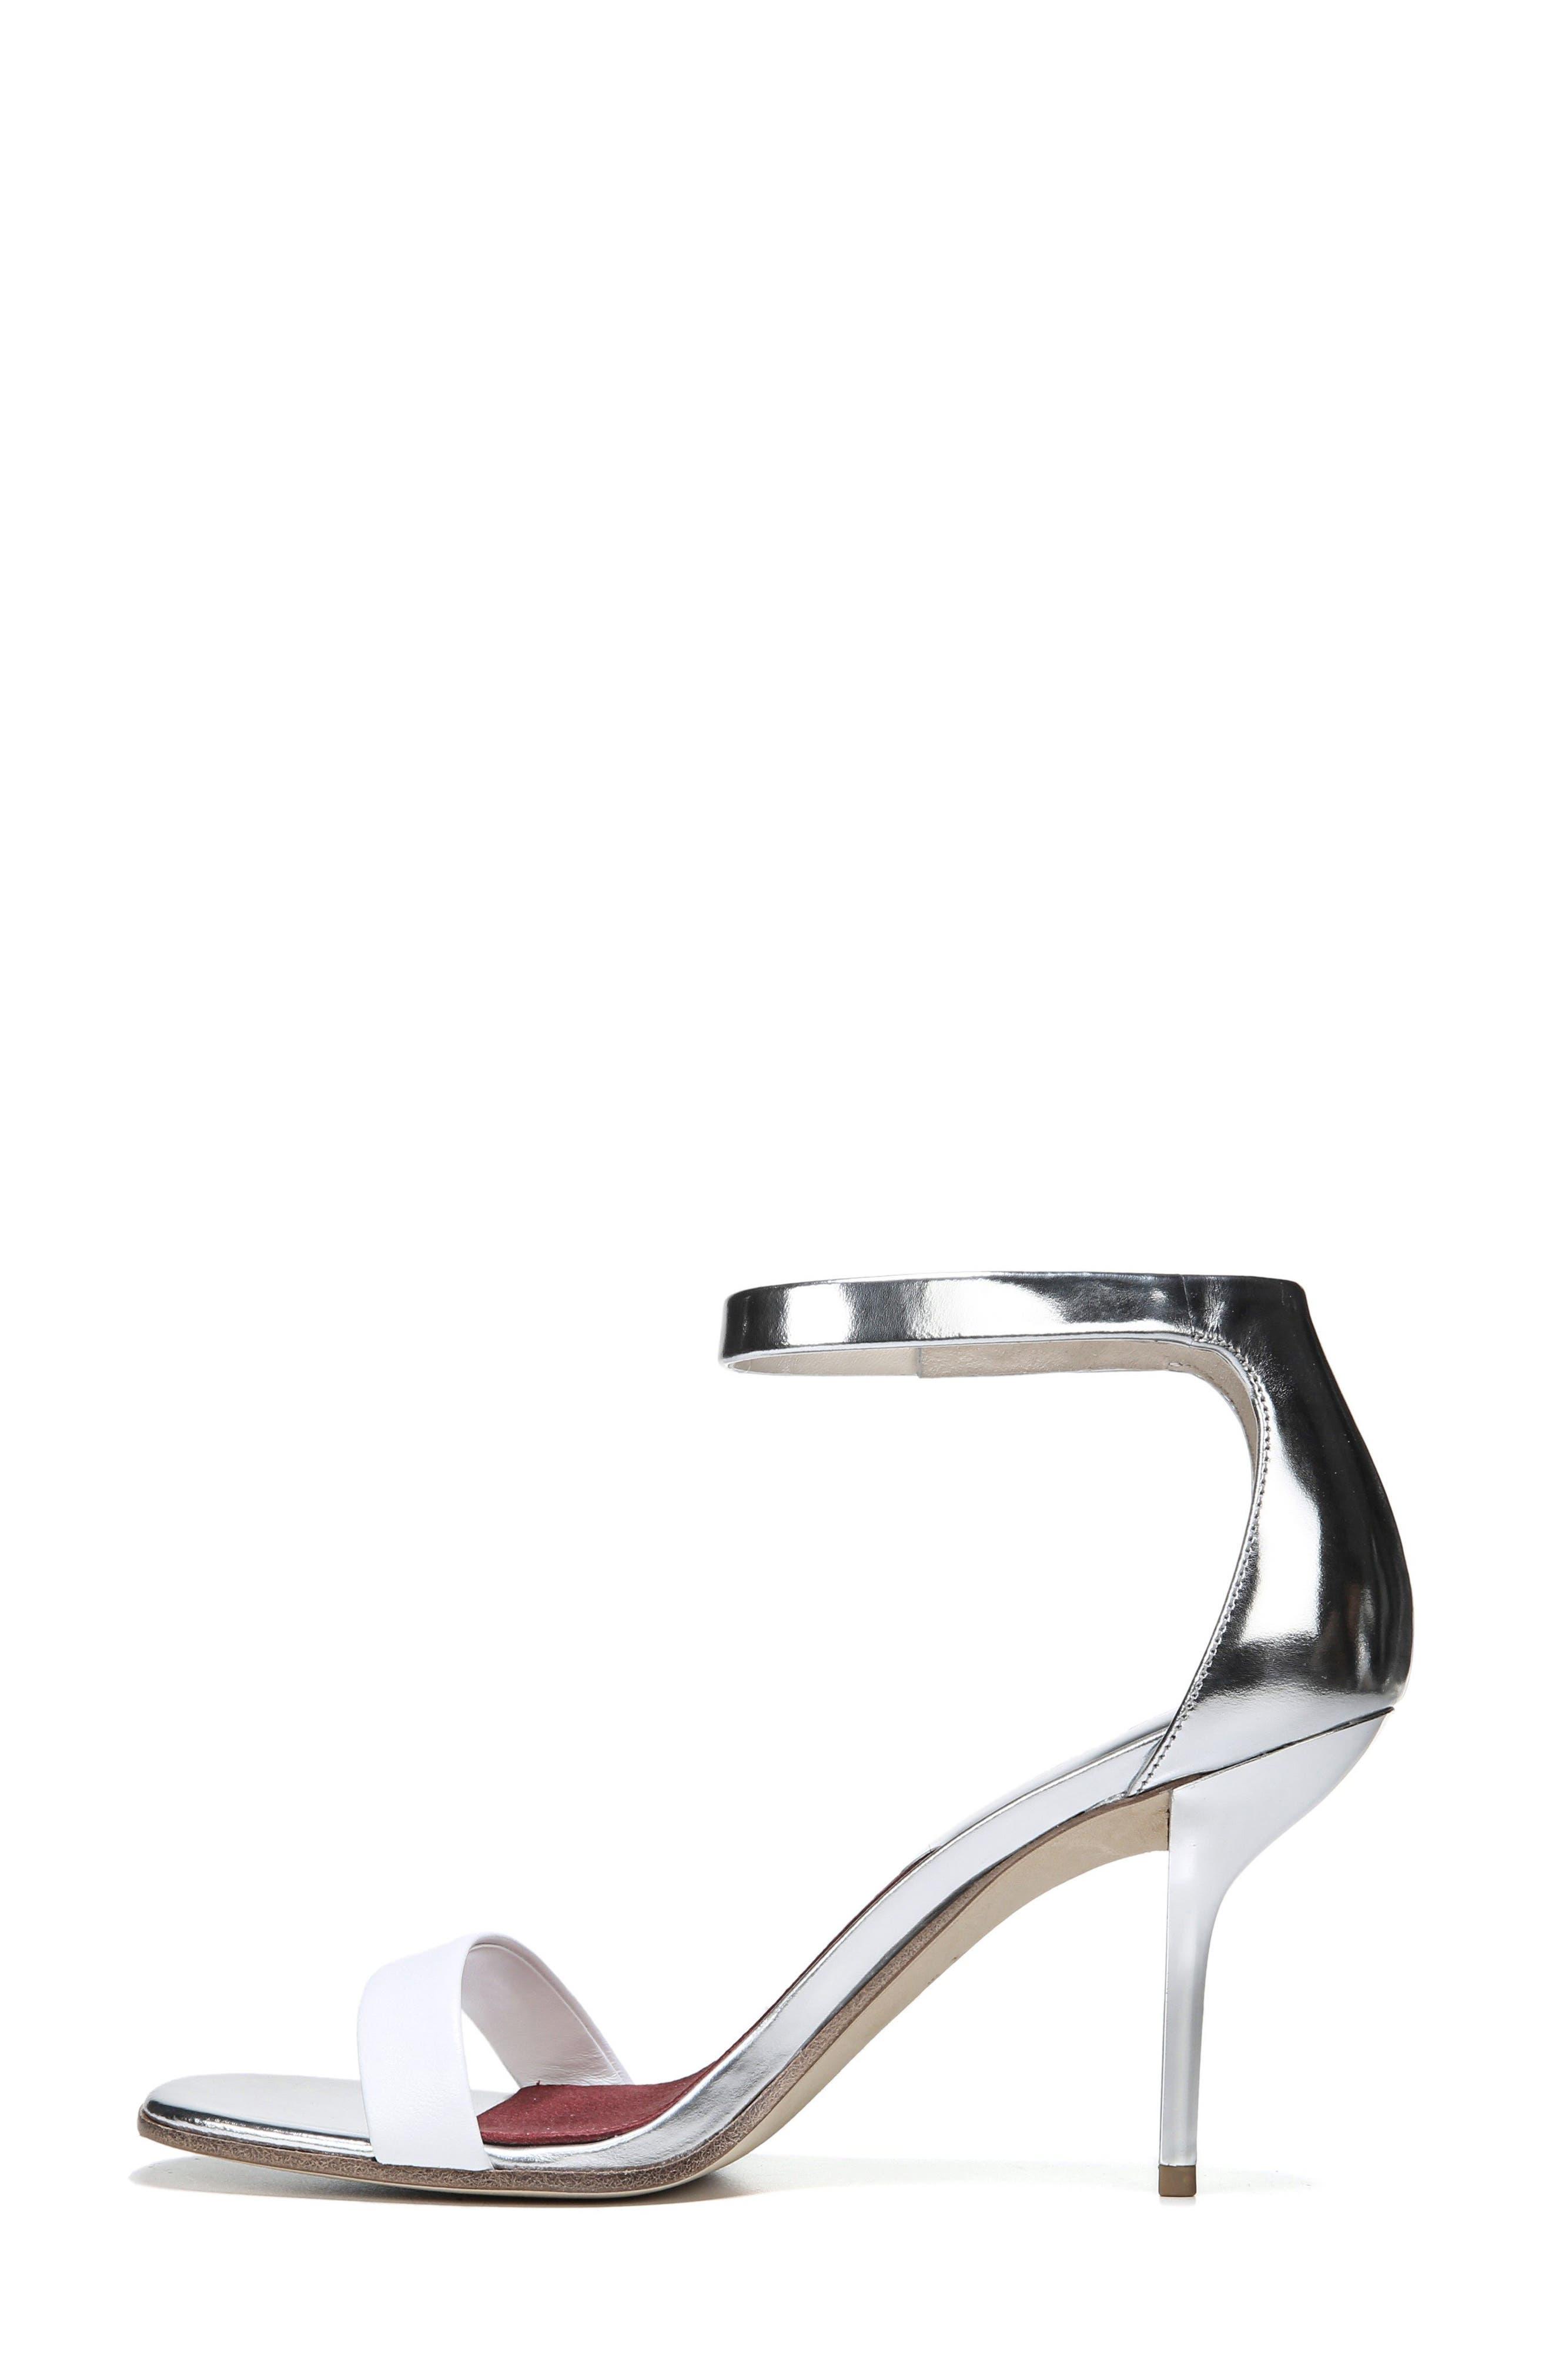 Ferrara Ankle Strap Sandal,                             Alternate thumbnail 9, color,